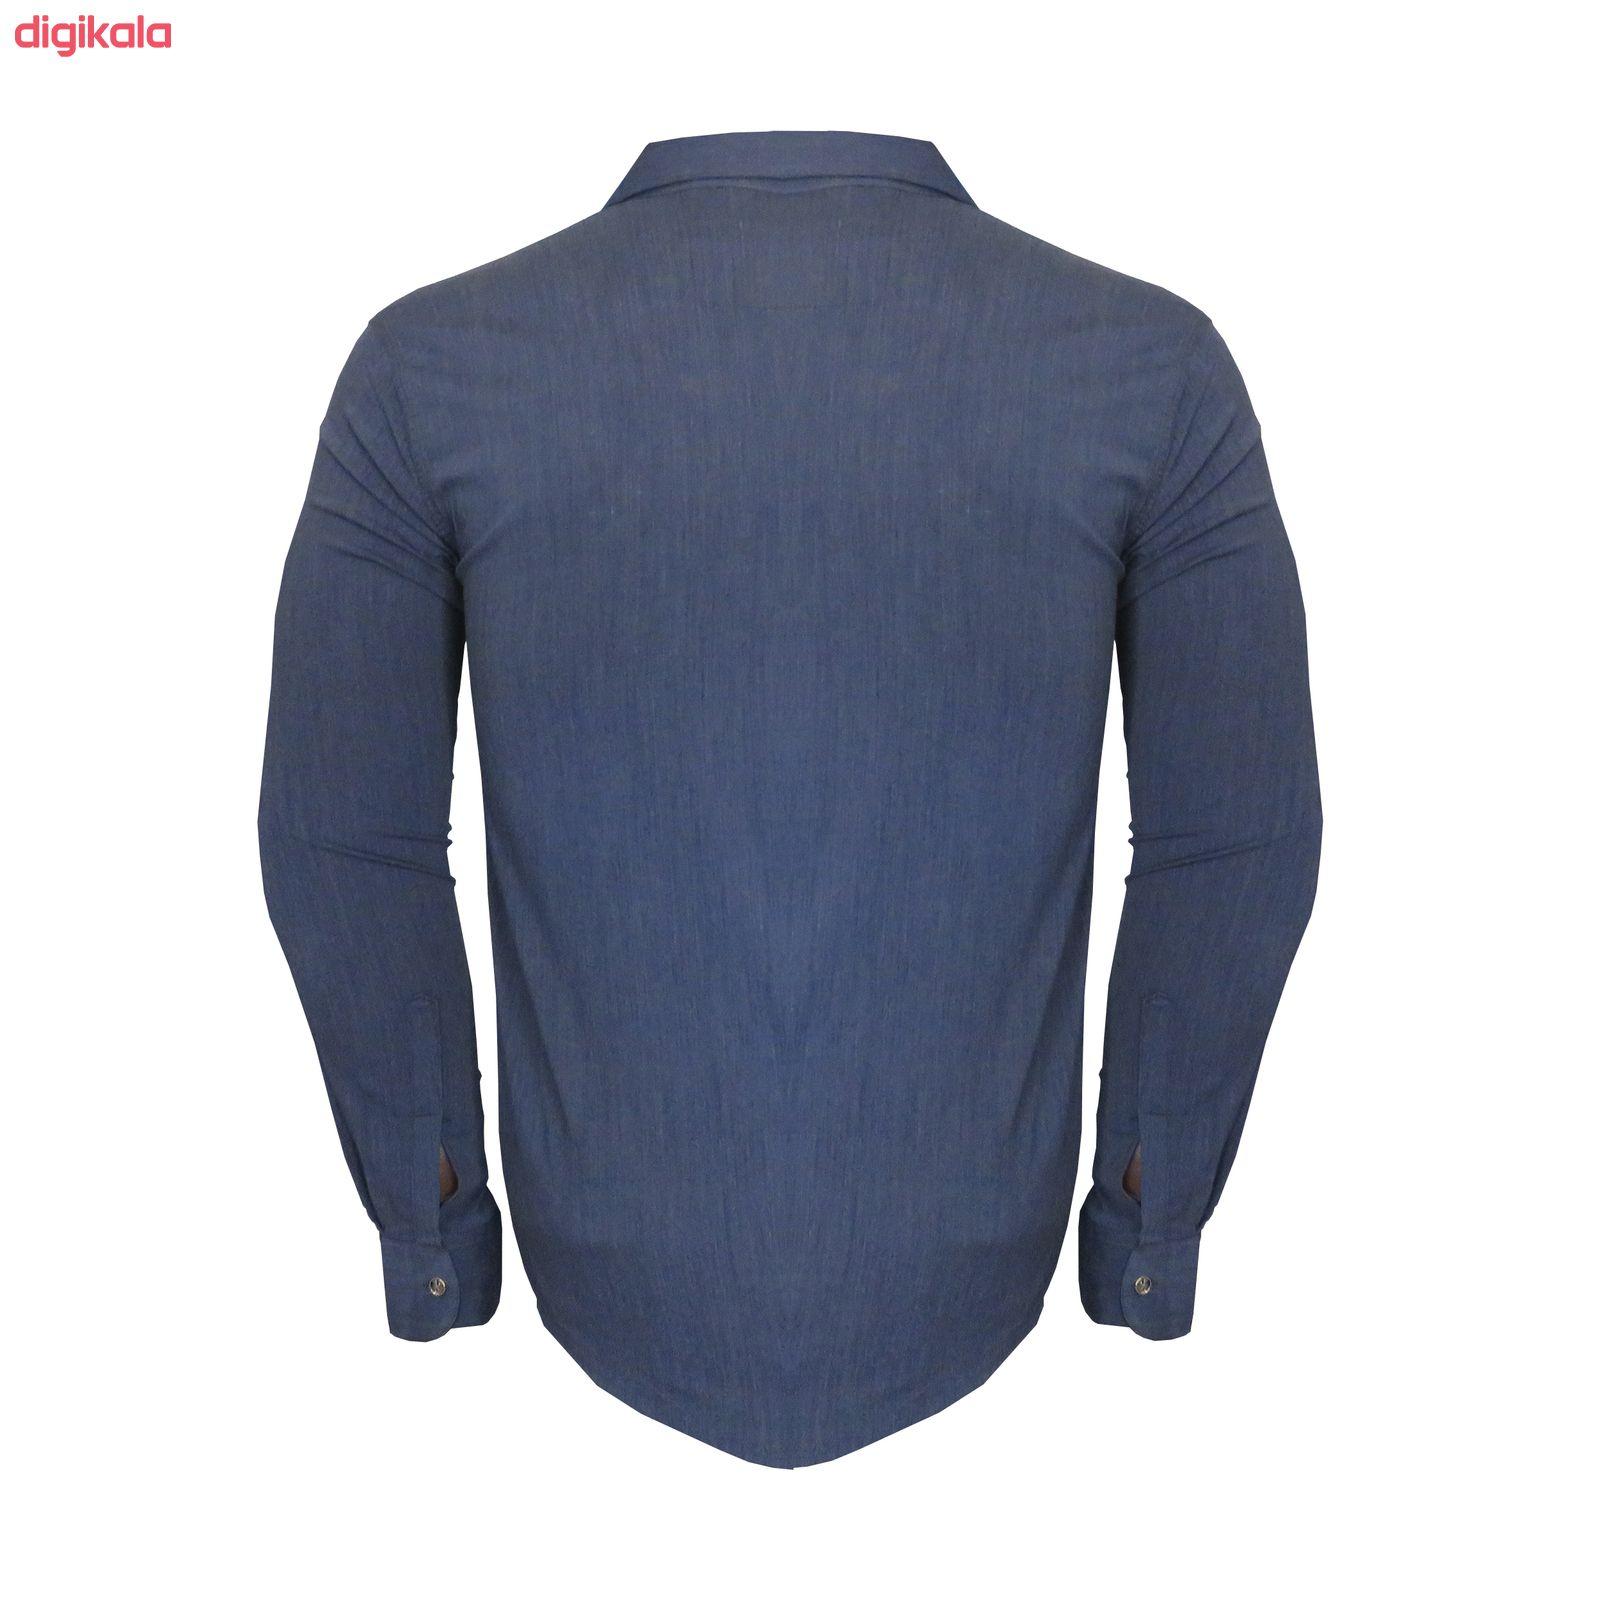 پیراهن مردانه کد PVLFZ9904B3 رنگ آبی main 1 2